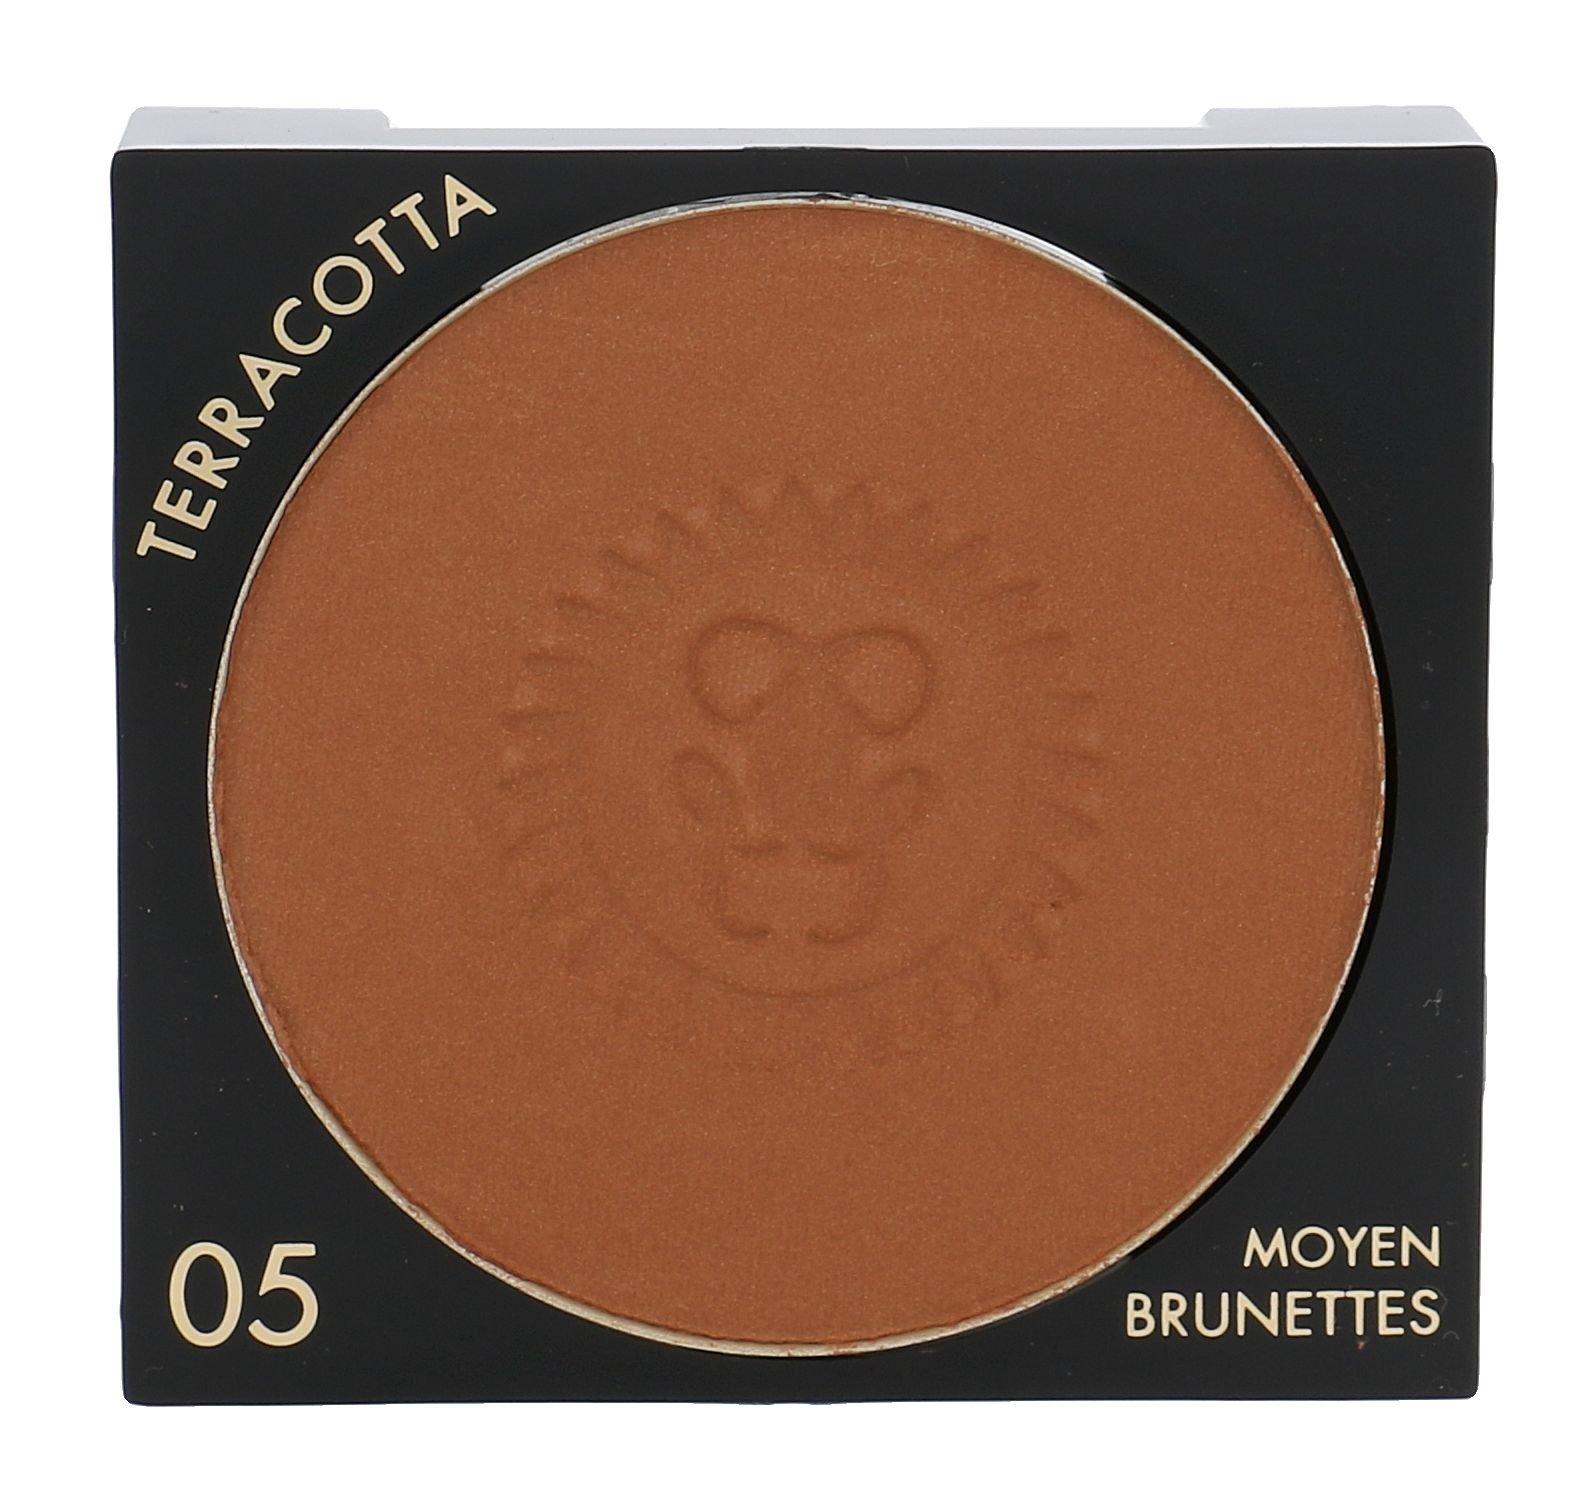 Guerlain Terracotta Cosmetic 6ml 05 Medium-Brunettes